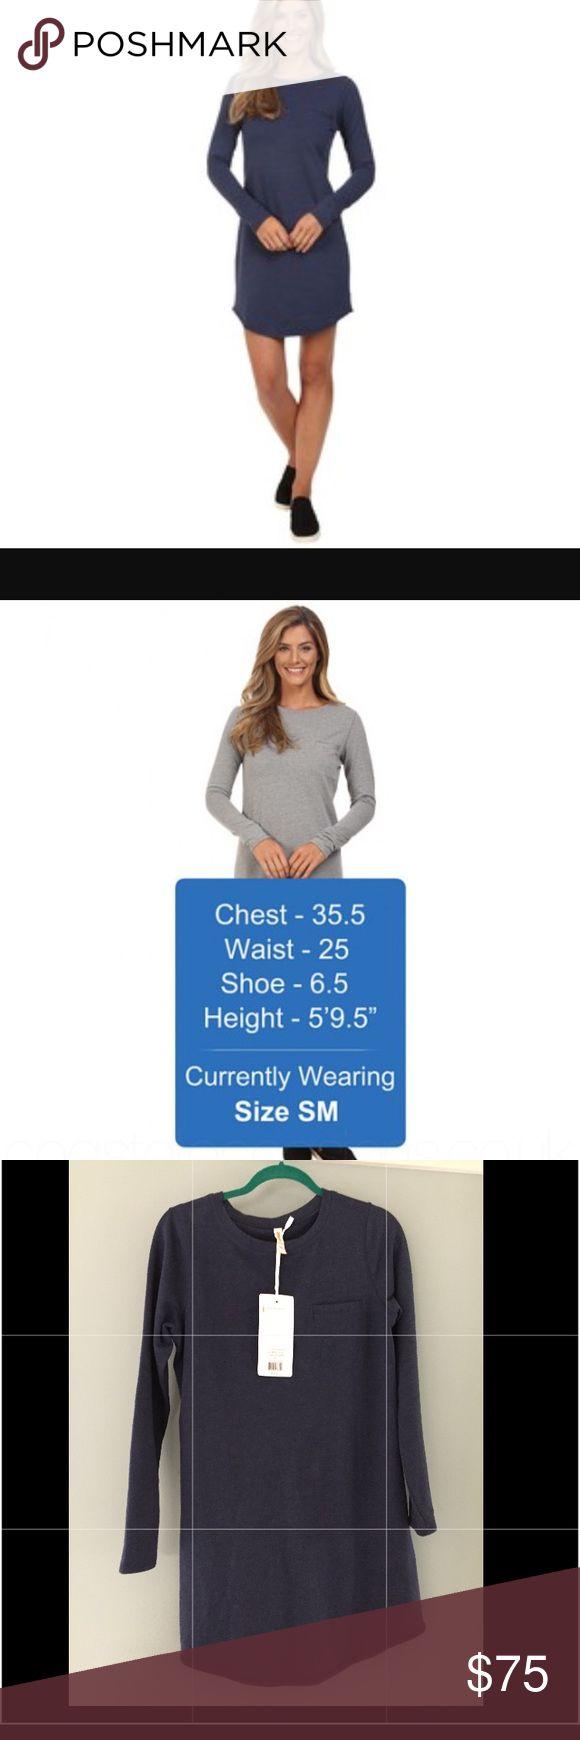 Lucy Activewear Everyday Dress Navy Heather Medium Soldout fall & winter everyday dress. $79. Lucy Dresses